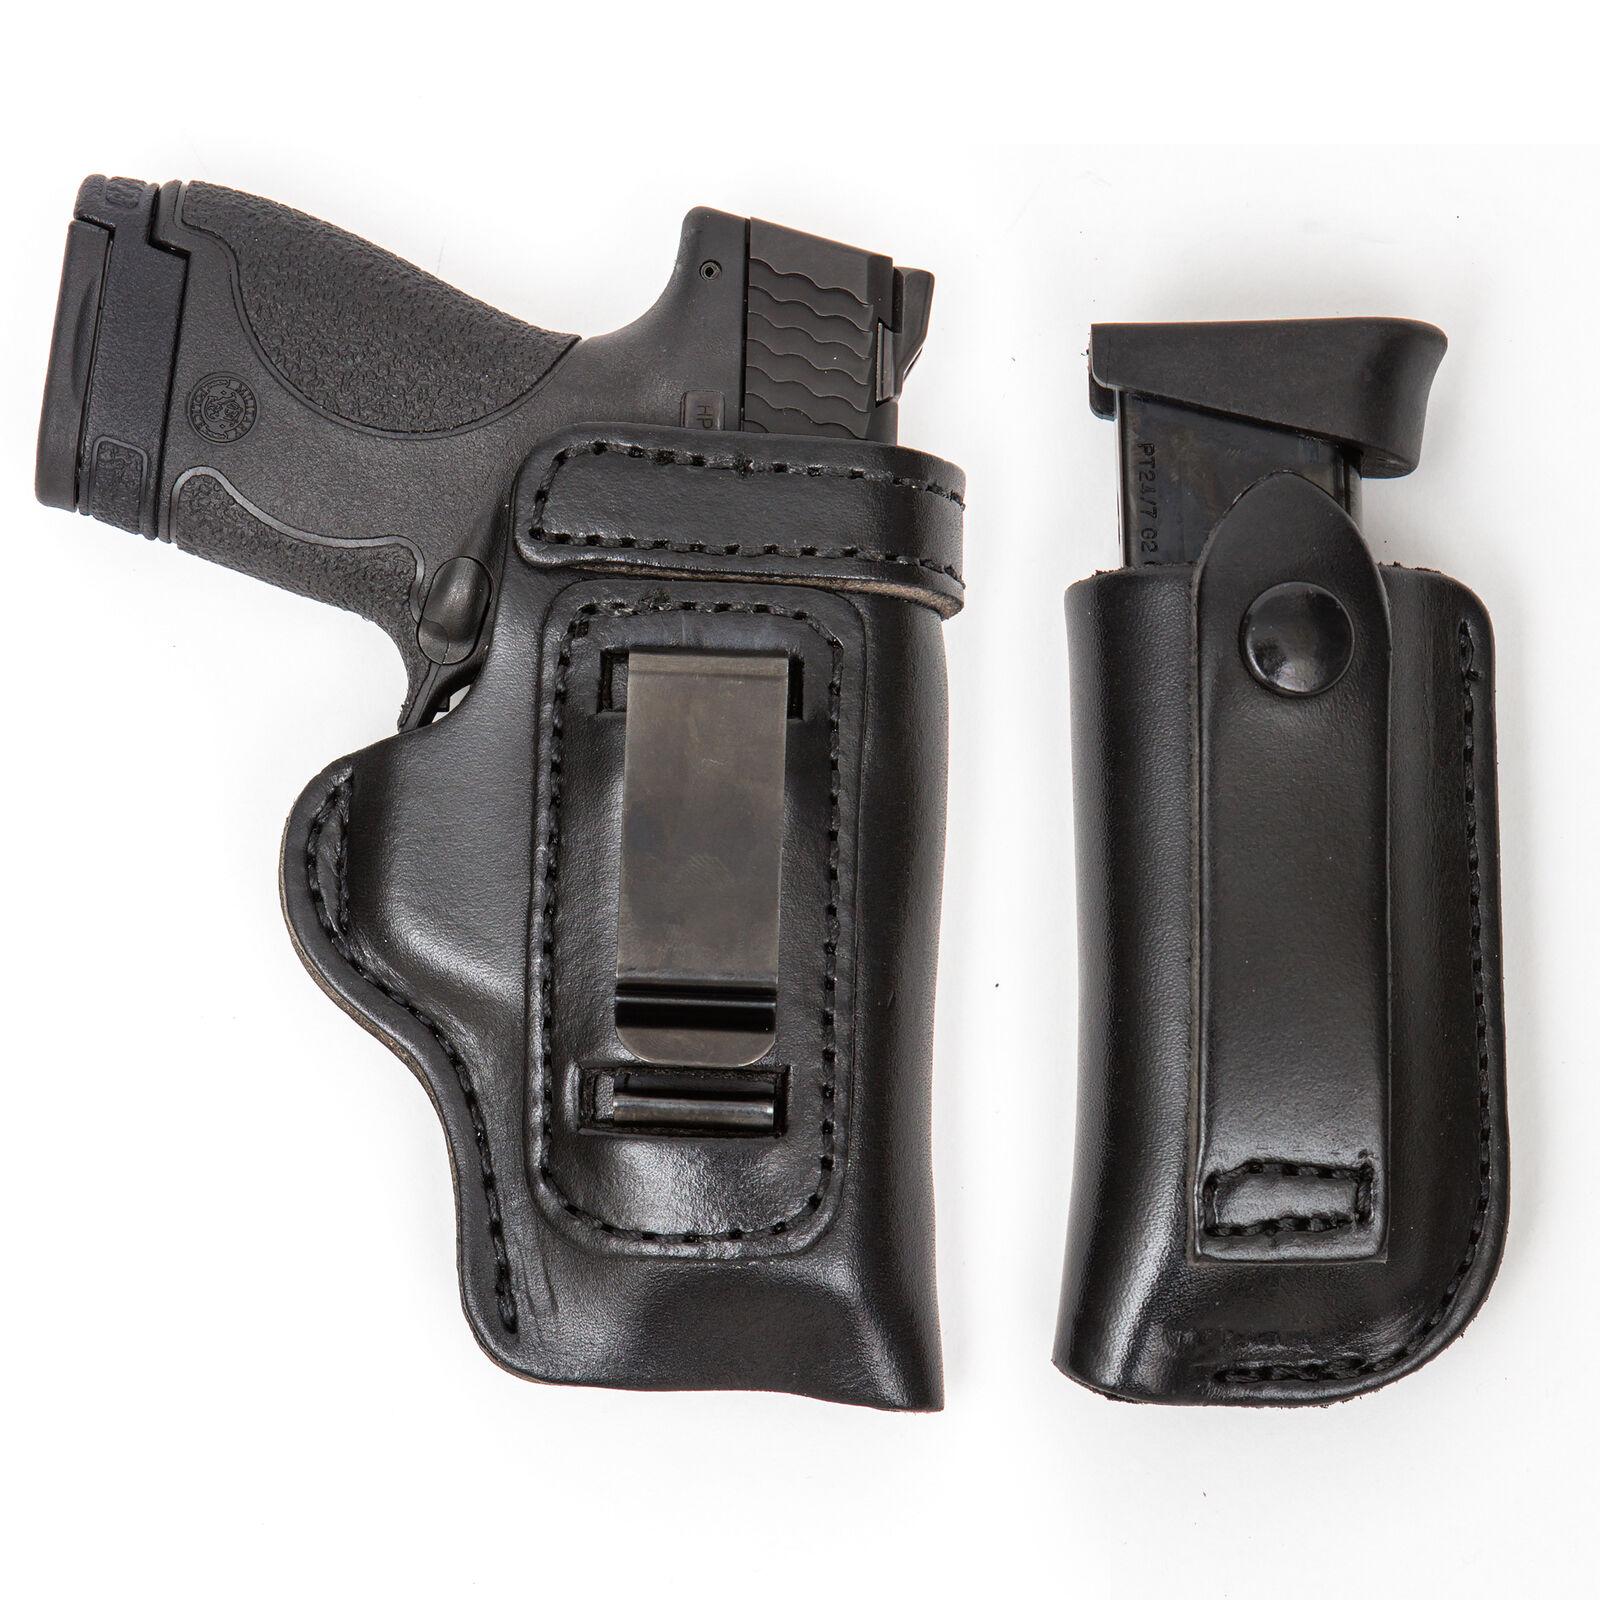 Combo Pack IWB owb RH LH Funda Pistola & Mag Para Beretta Px Storm Sub compacto